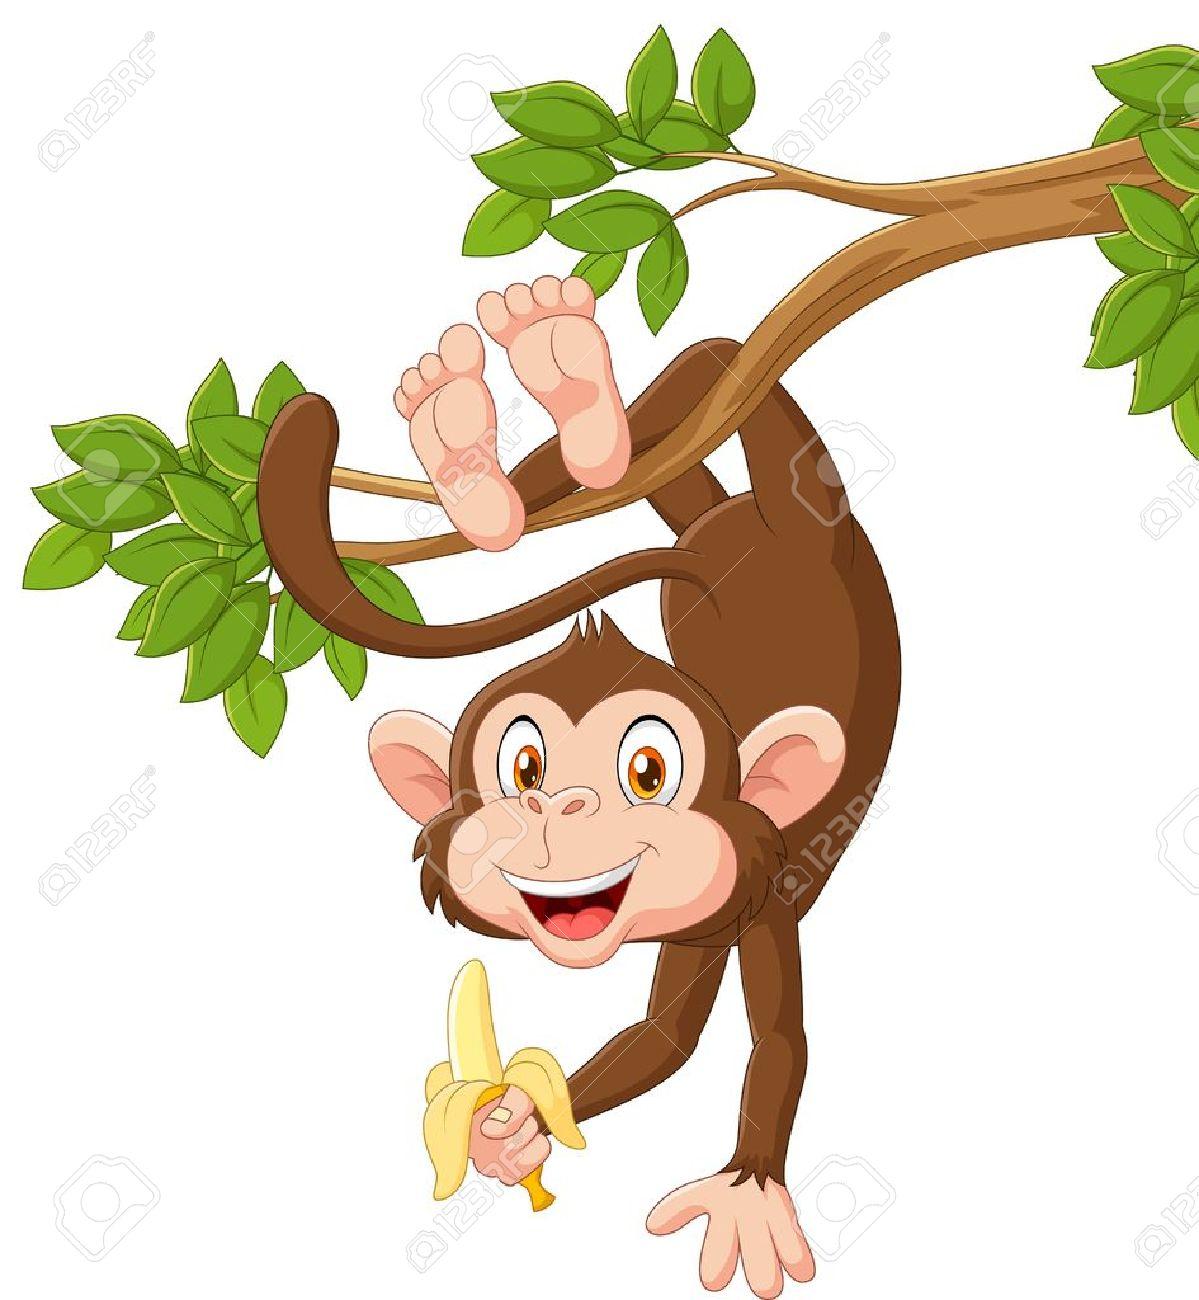 Vector illustration of Cartoon happy monkey hanging and holding banana Stock Vector - 49007639